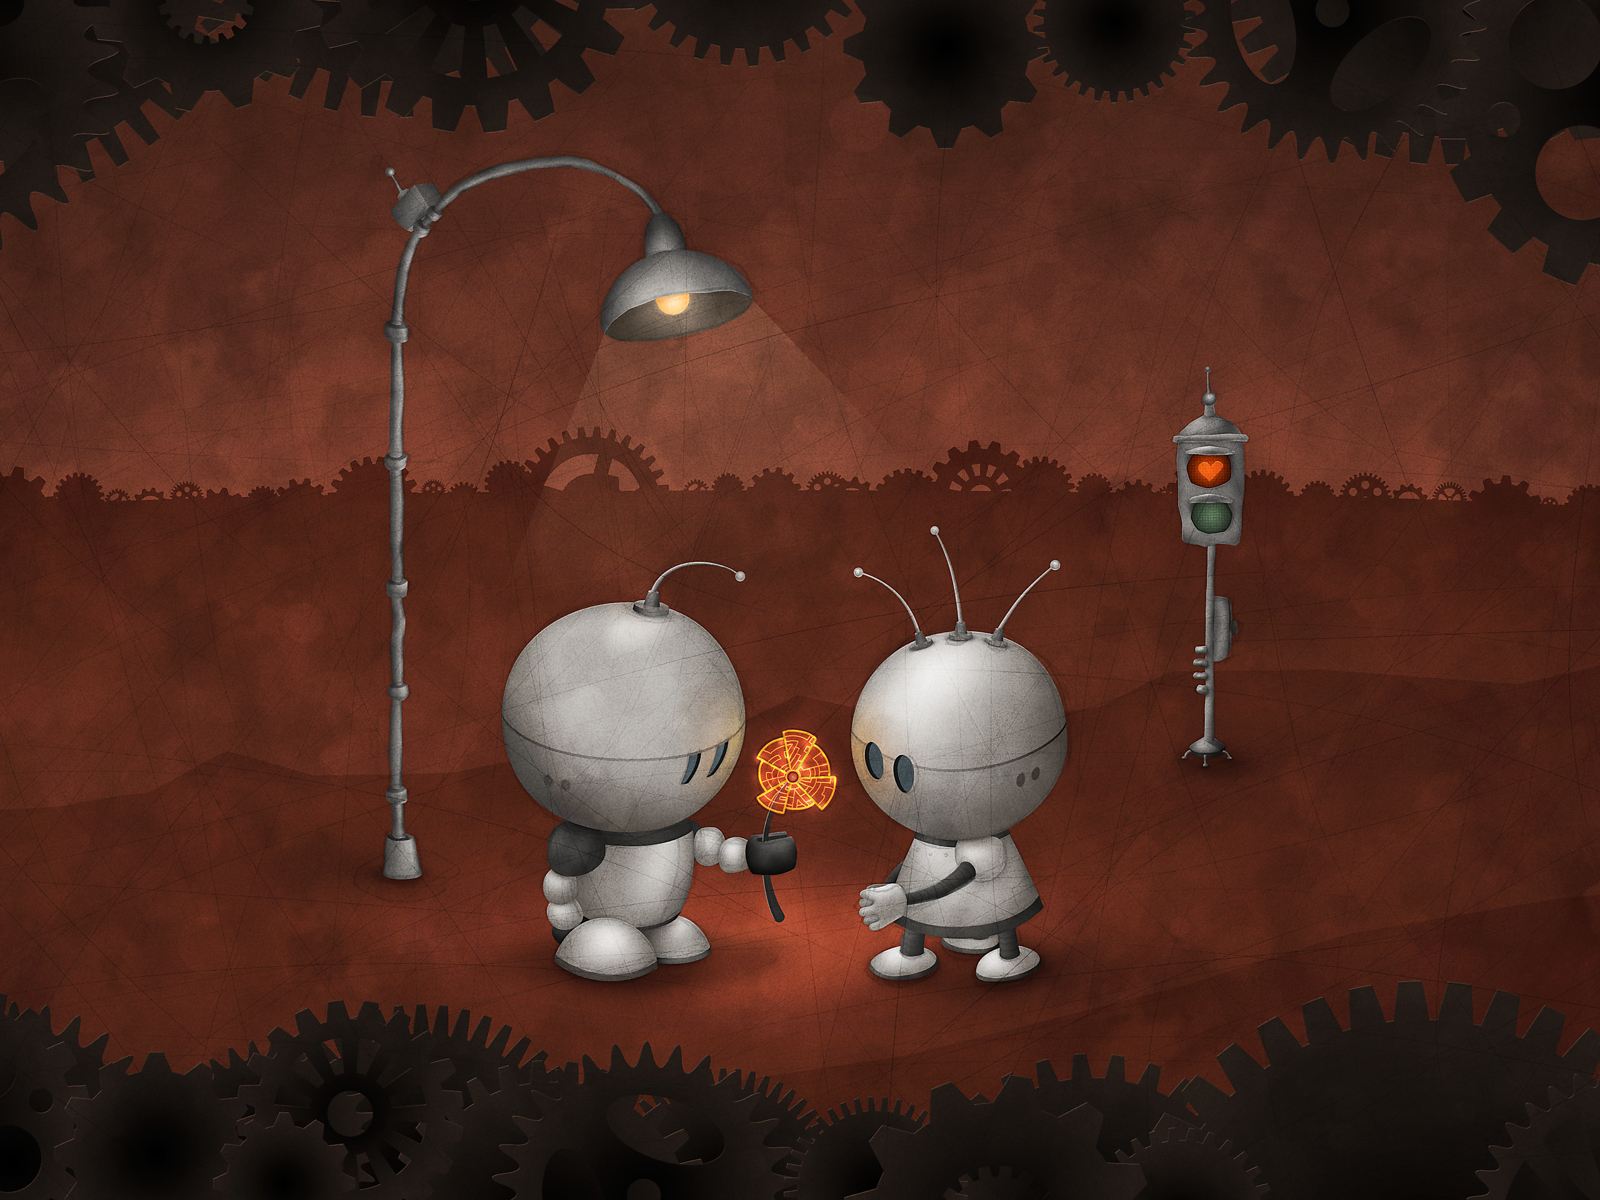 Robots in love by vladstudio